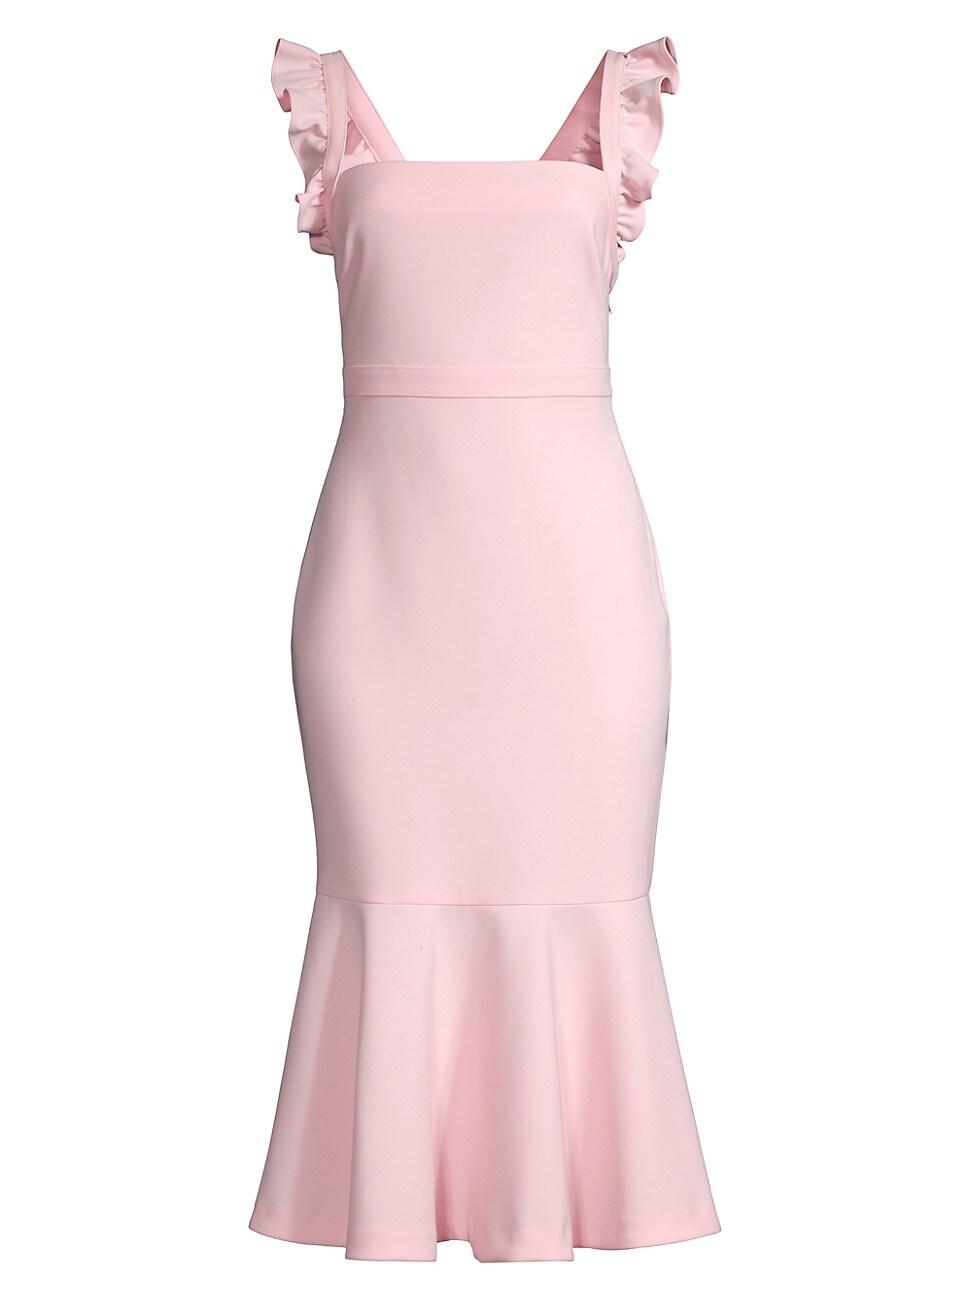 Likely WOMEN'S FAVORITE STRETCH HARA DRESS